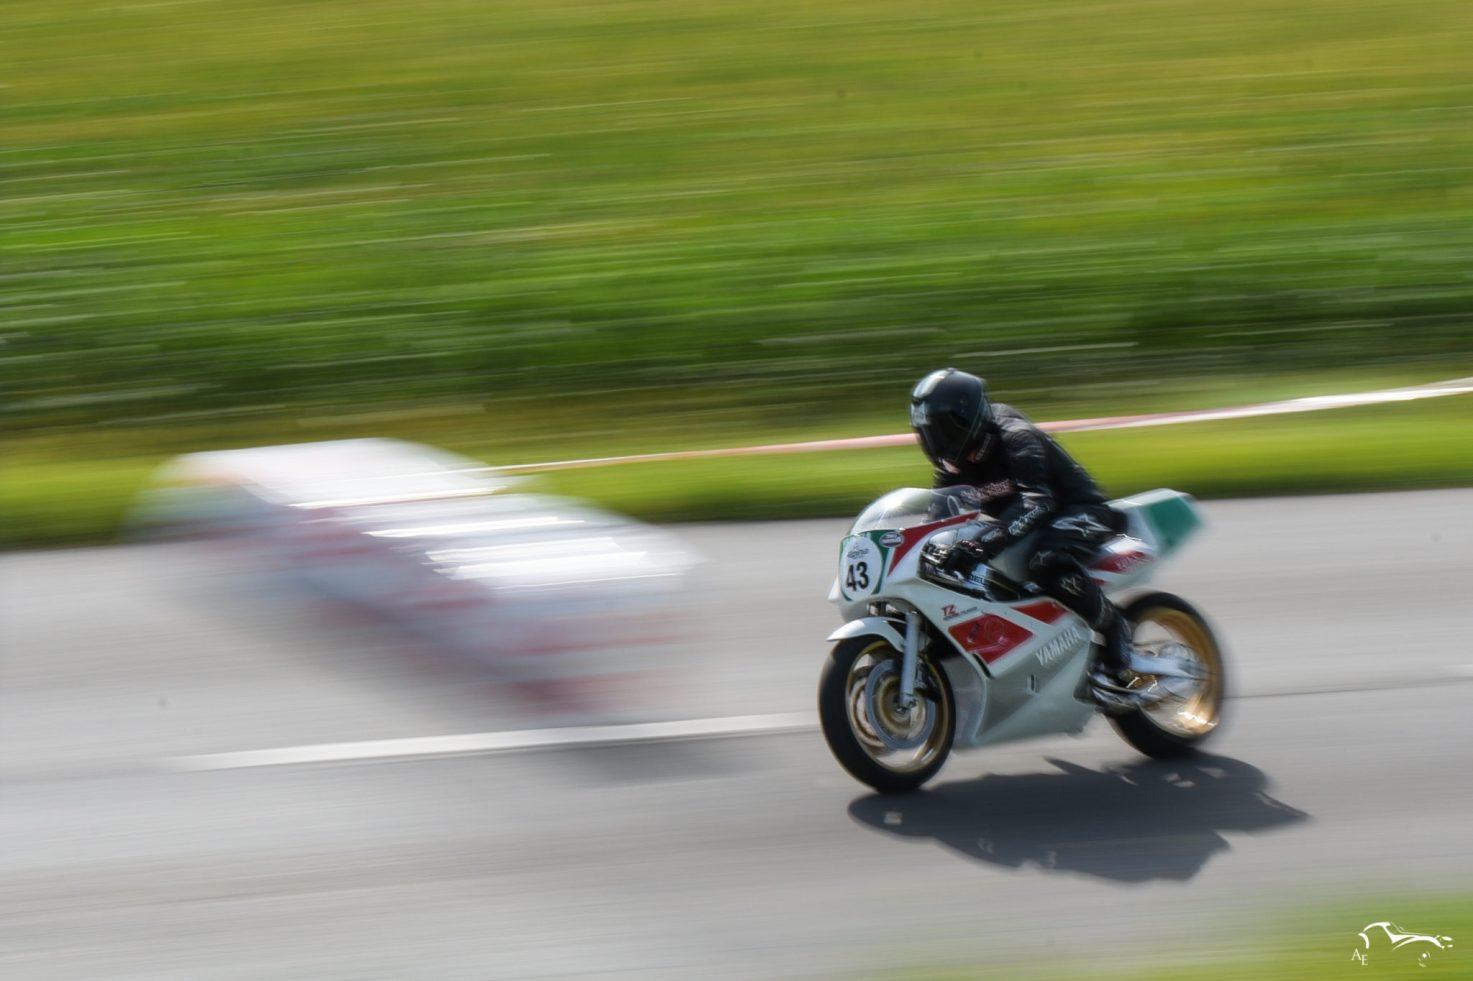 Yamaha TZ 250 cc 1989